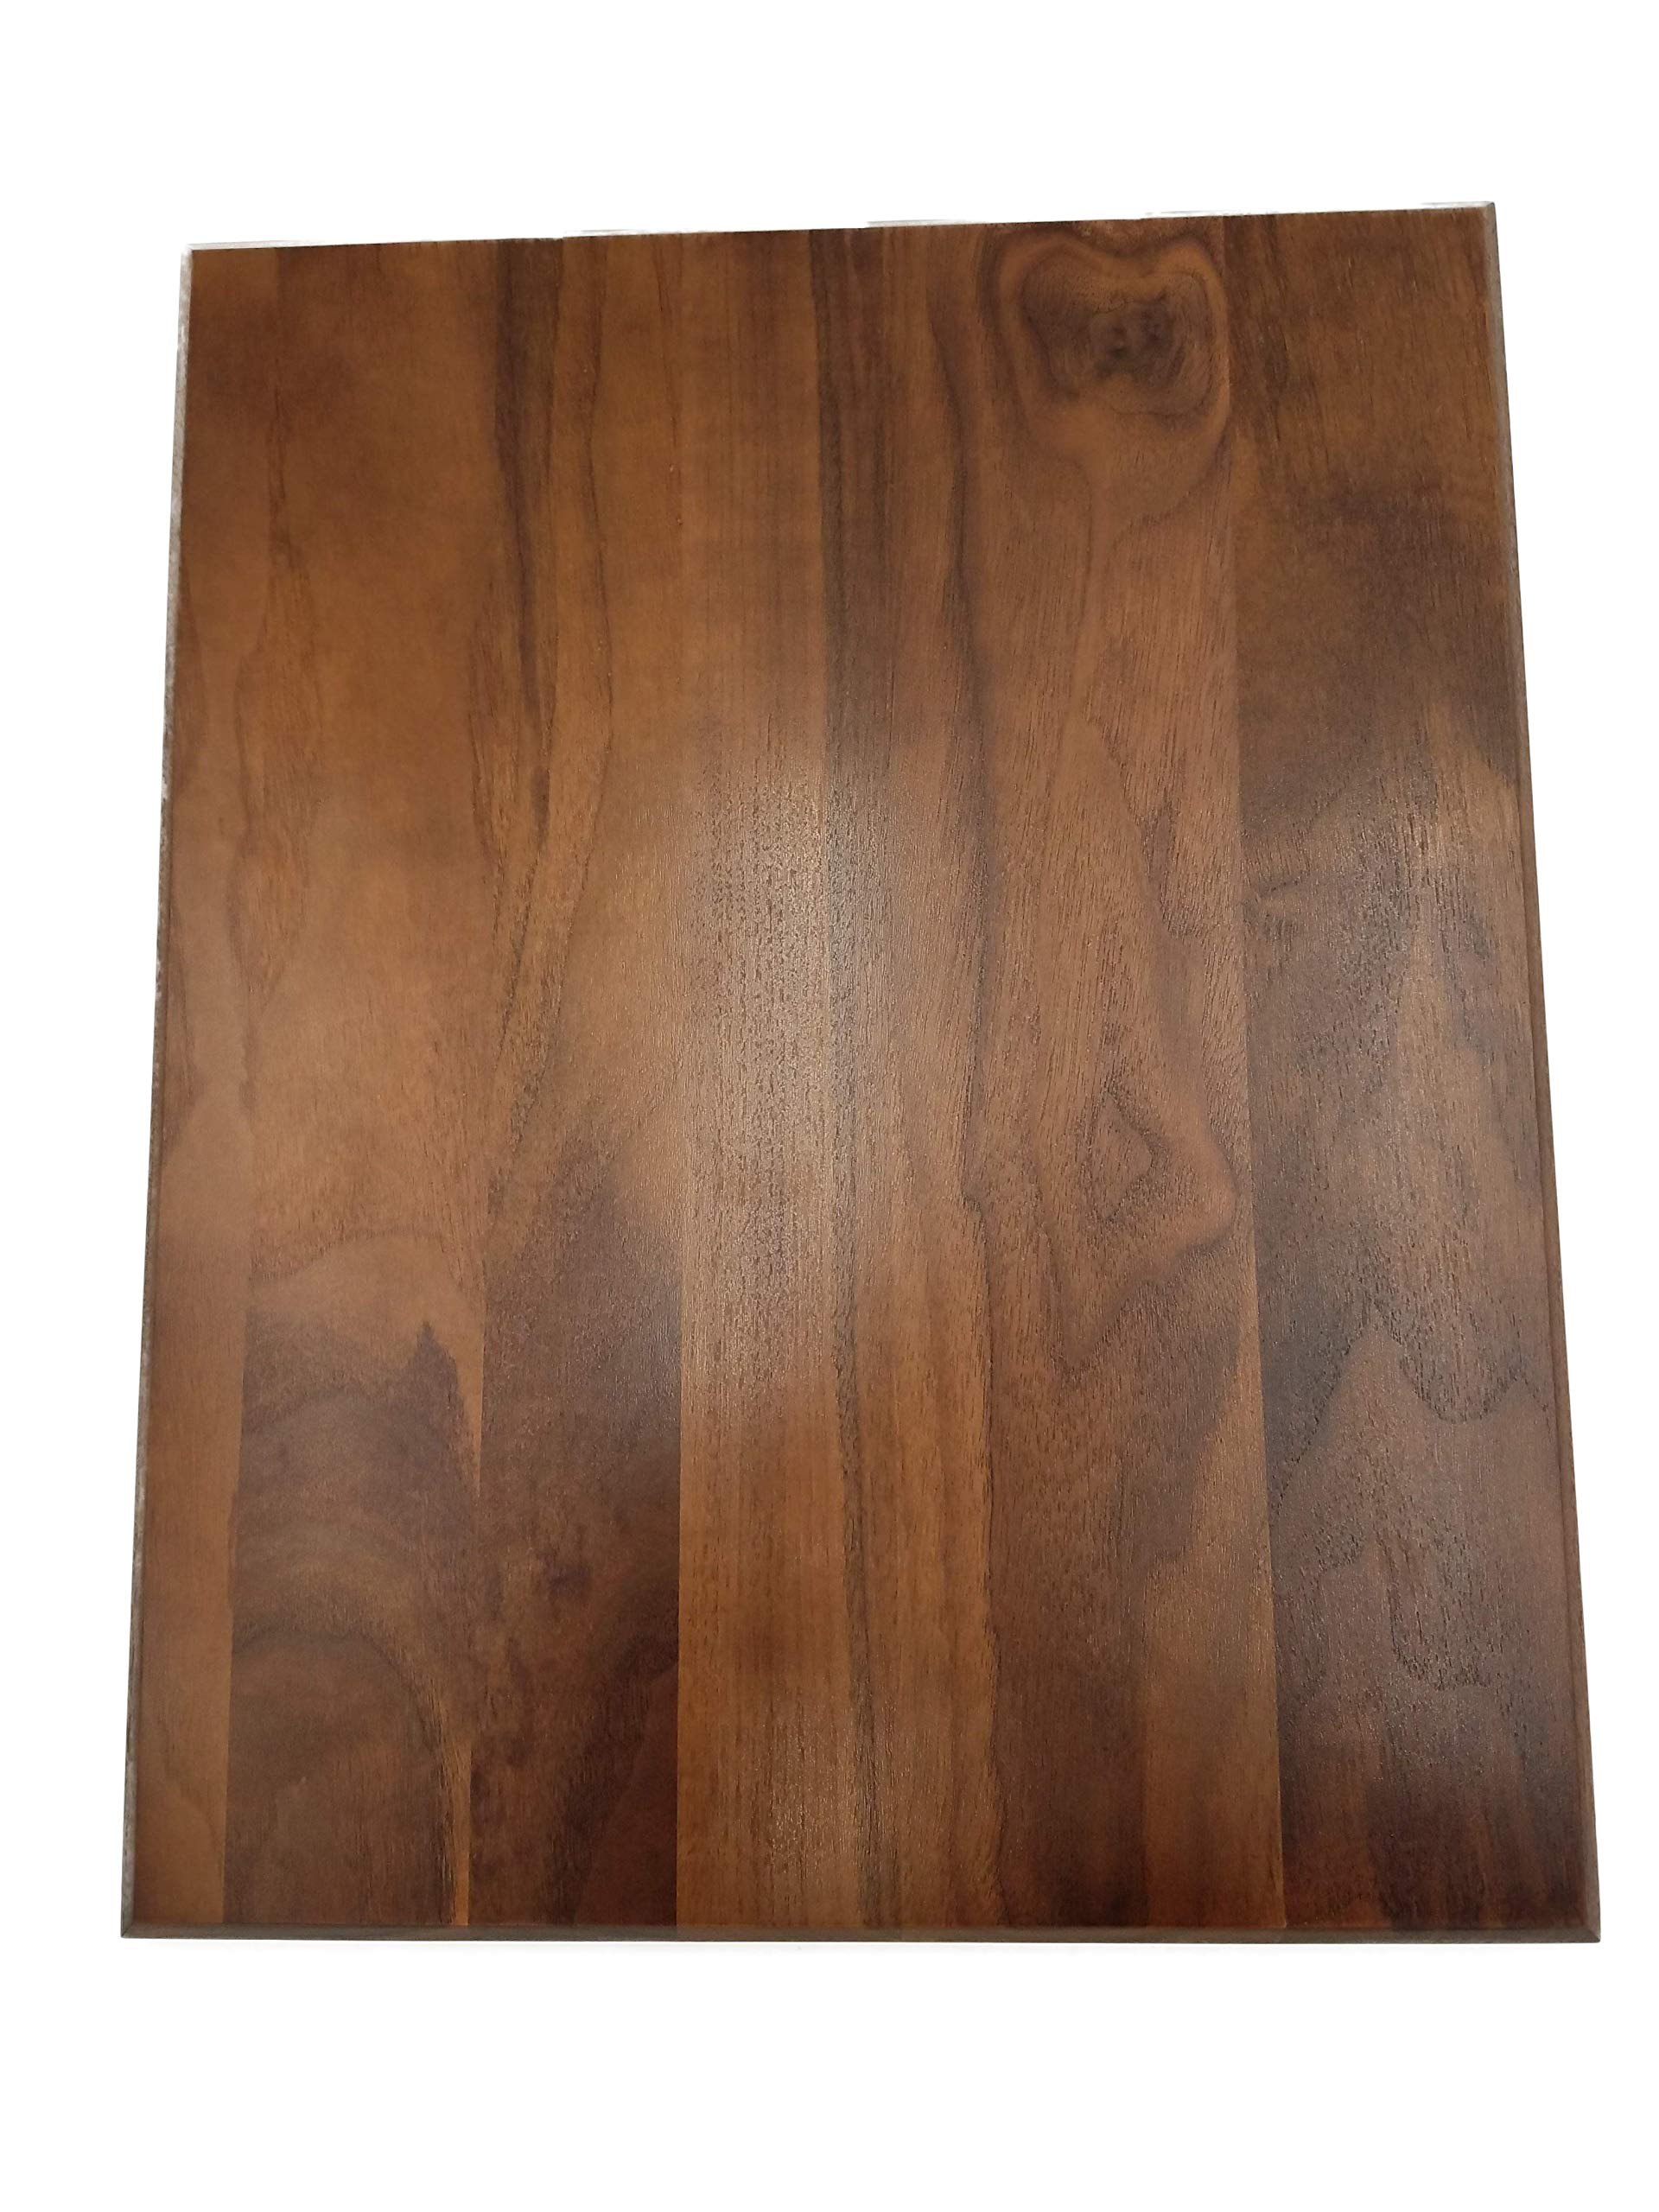 Solid Walnut 45° Bevel Plaque (16'' x 20'' x 3/4'' - 1 Pc) by Barrington Hardwoods